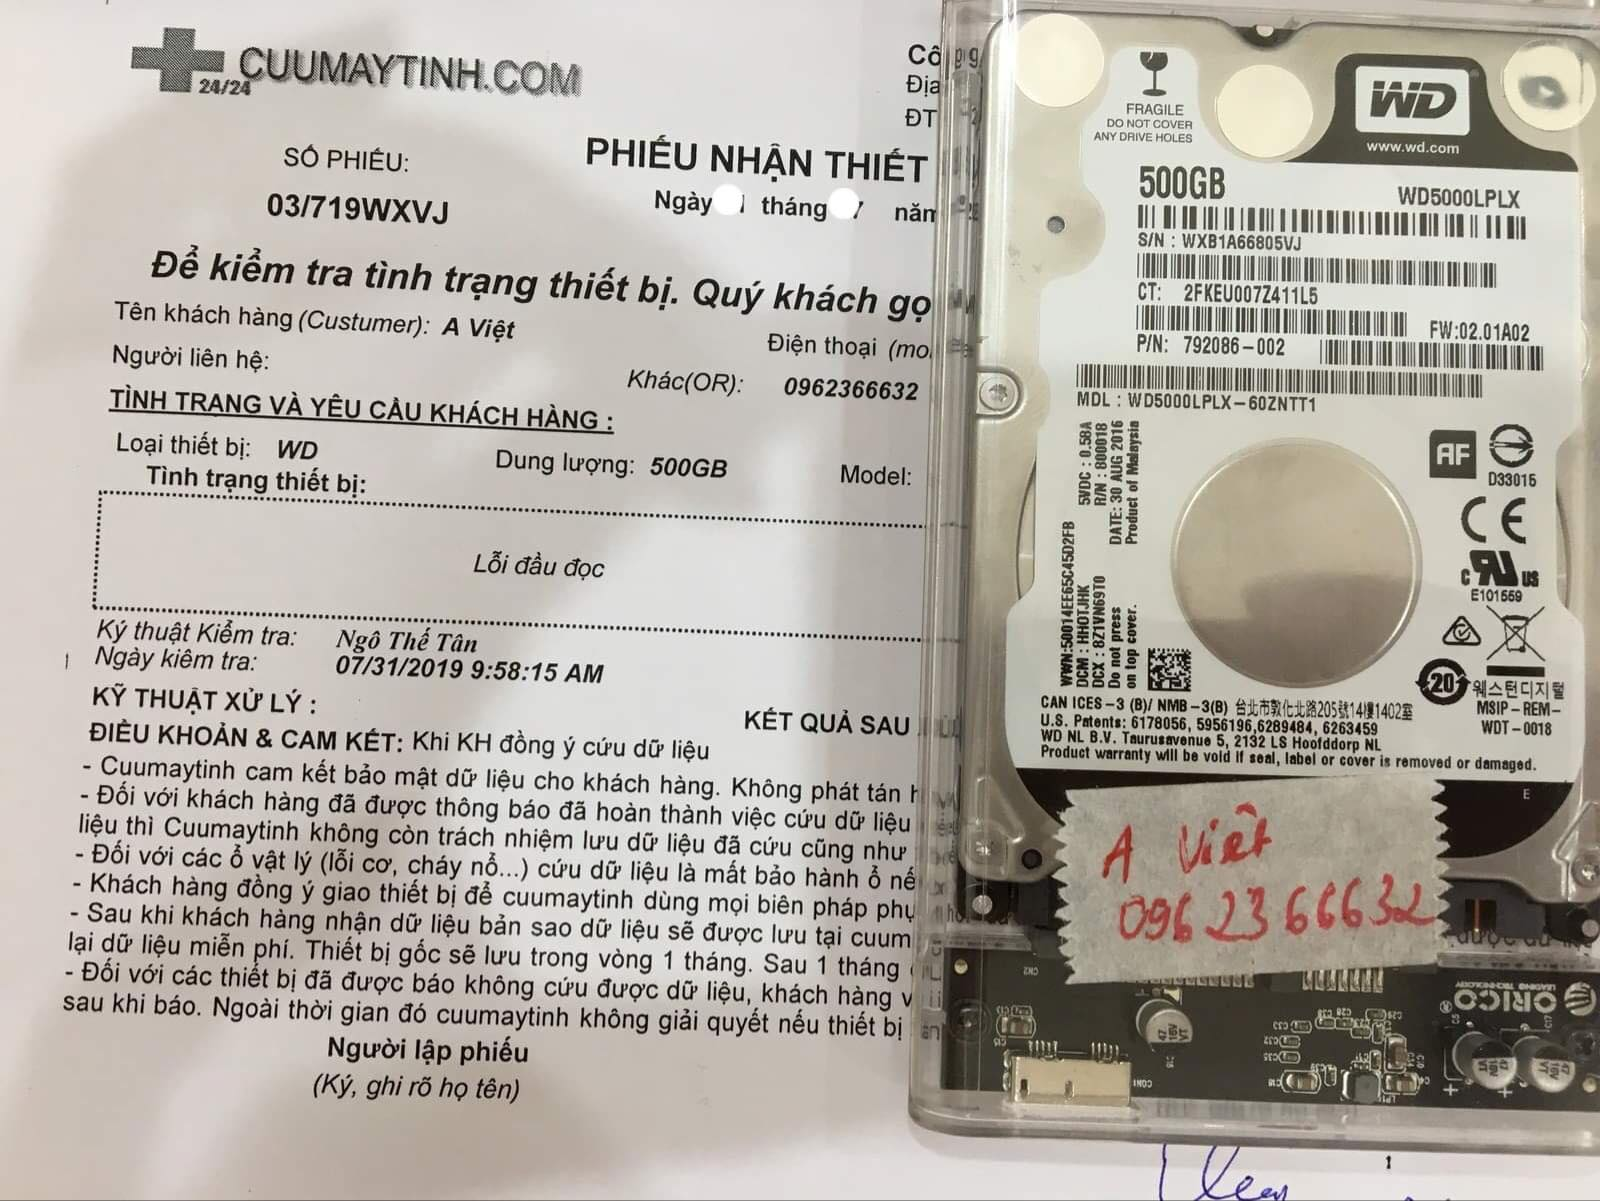 Lấy dữ liệu ổ cứng Western 500GB lỗi đầu đọc 09/08/2019 - cuumaytinh